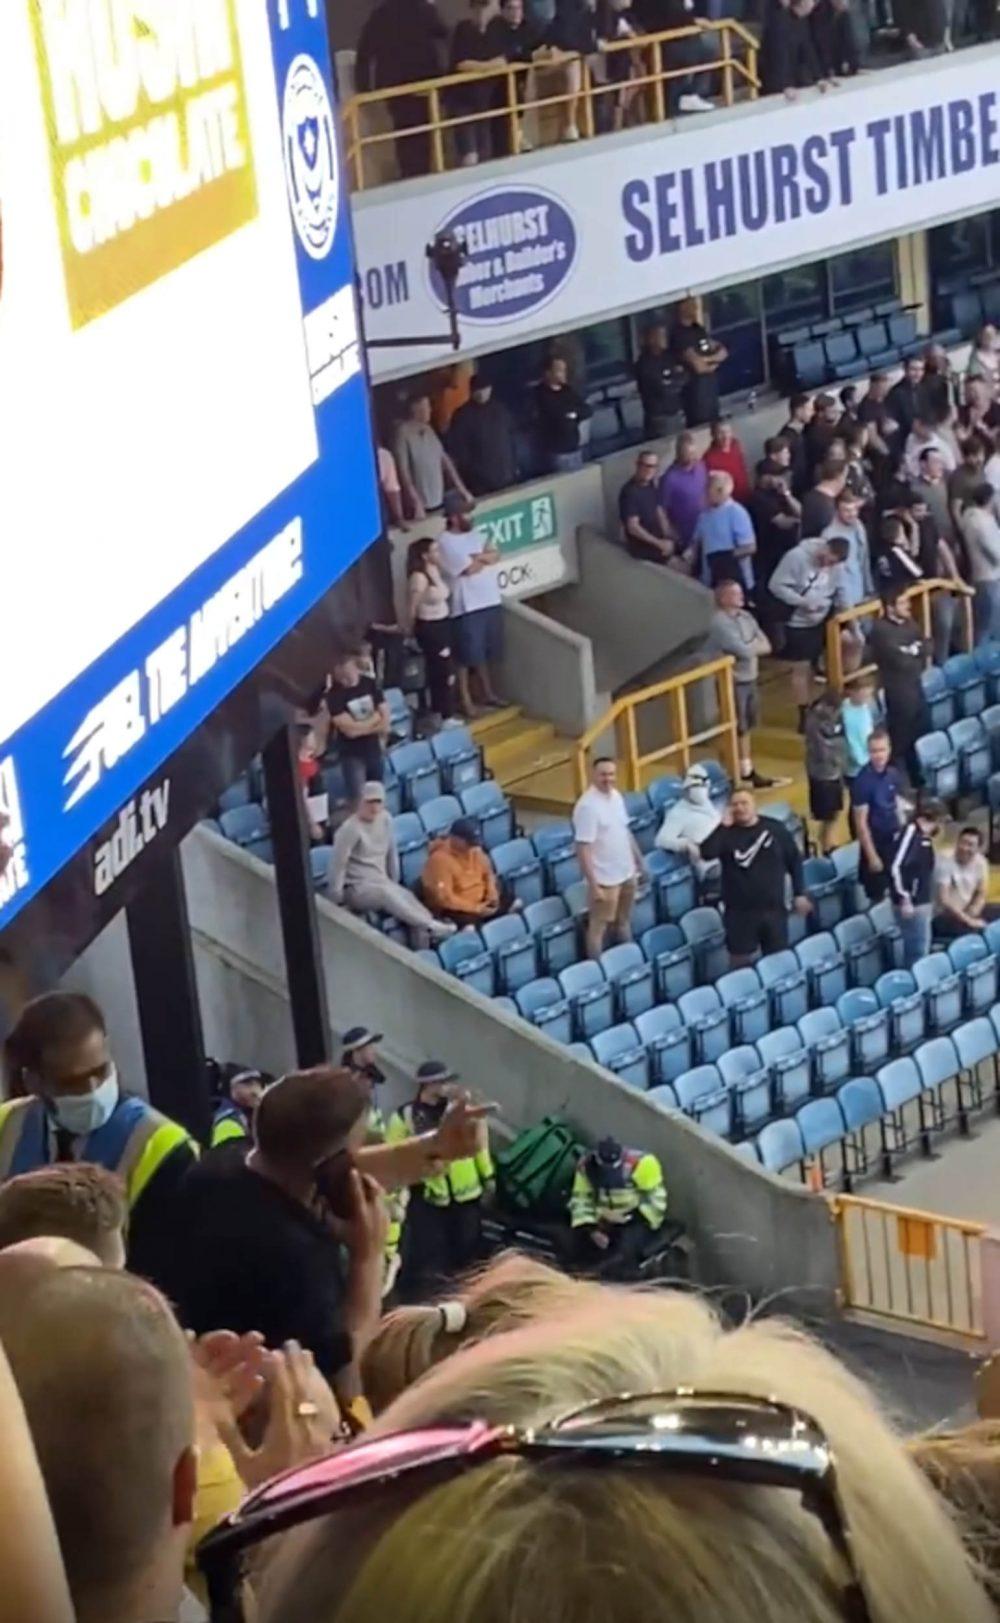 Footie fans on phone - Football News UK